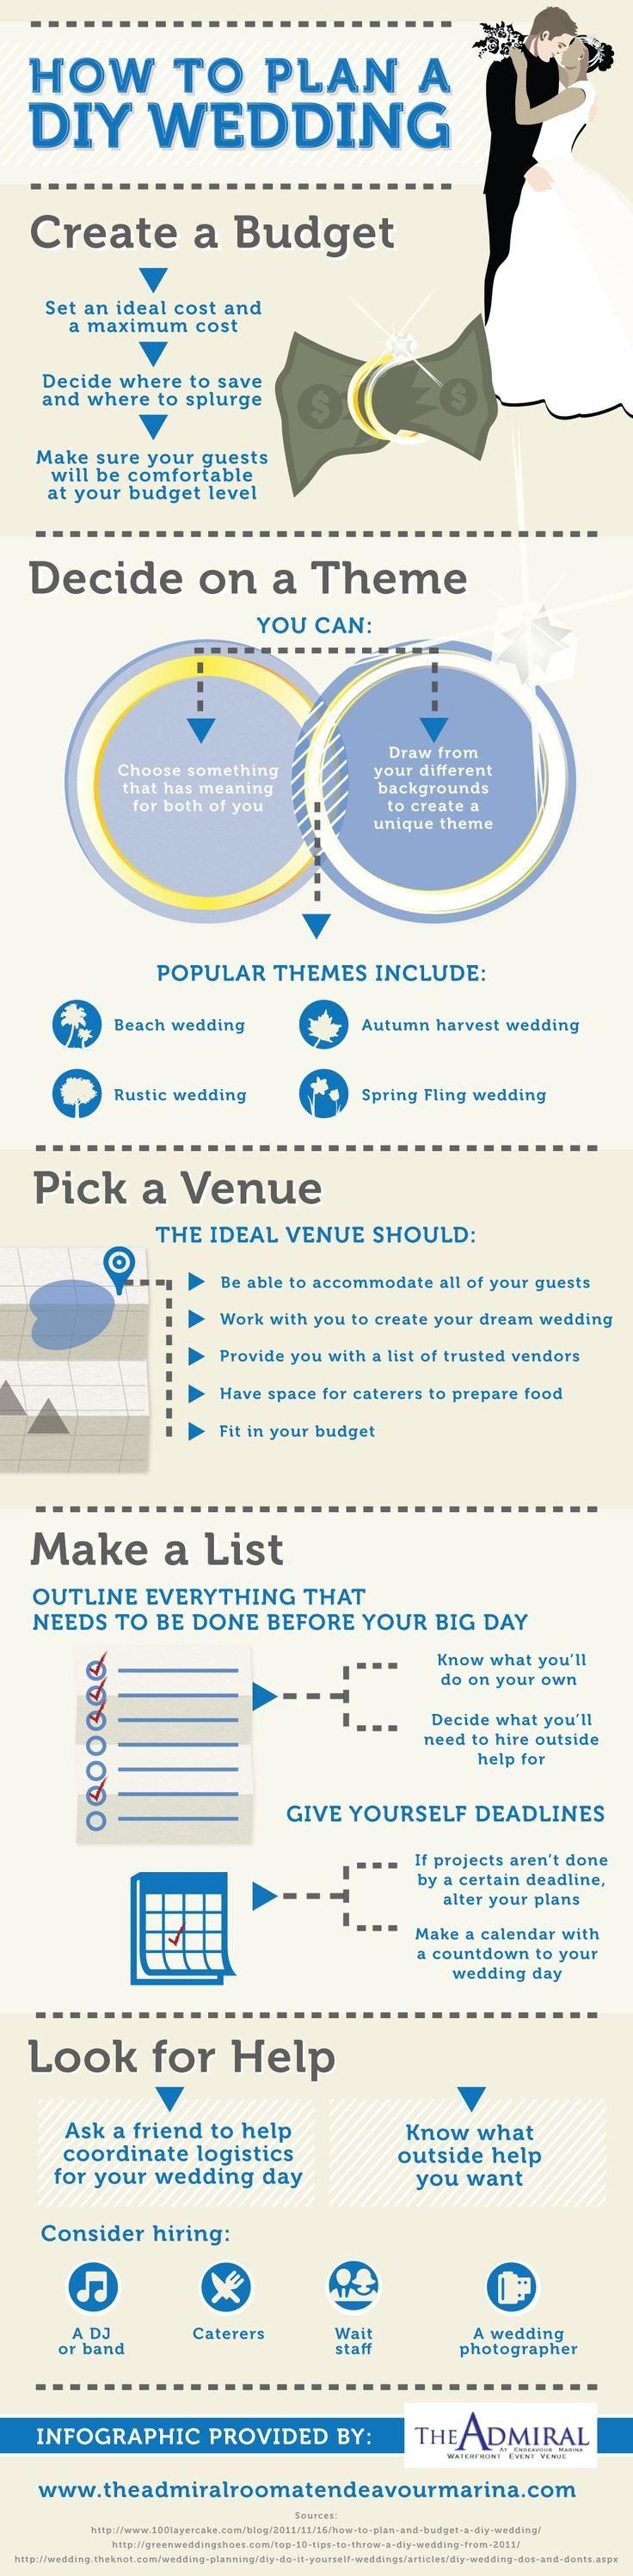 How to create a DIY wedding on a budget! Earn extra rewards on wedding supplies by purchasing online supplies through stuffdot.com #dot4rewards